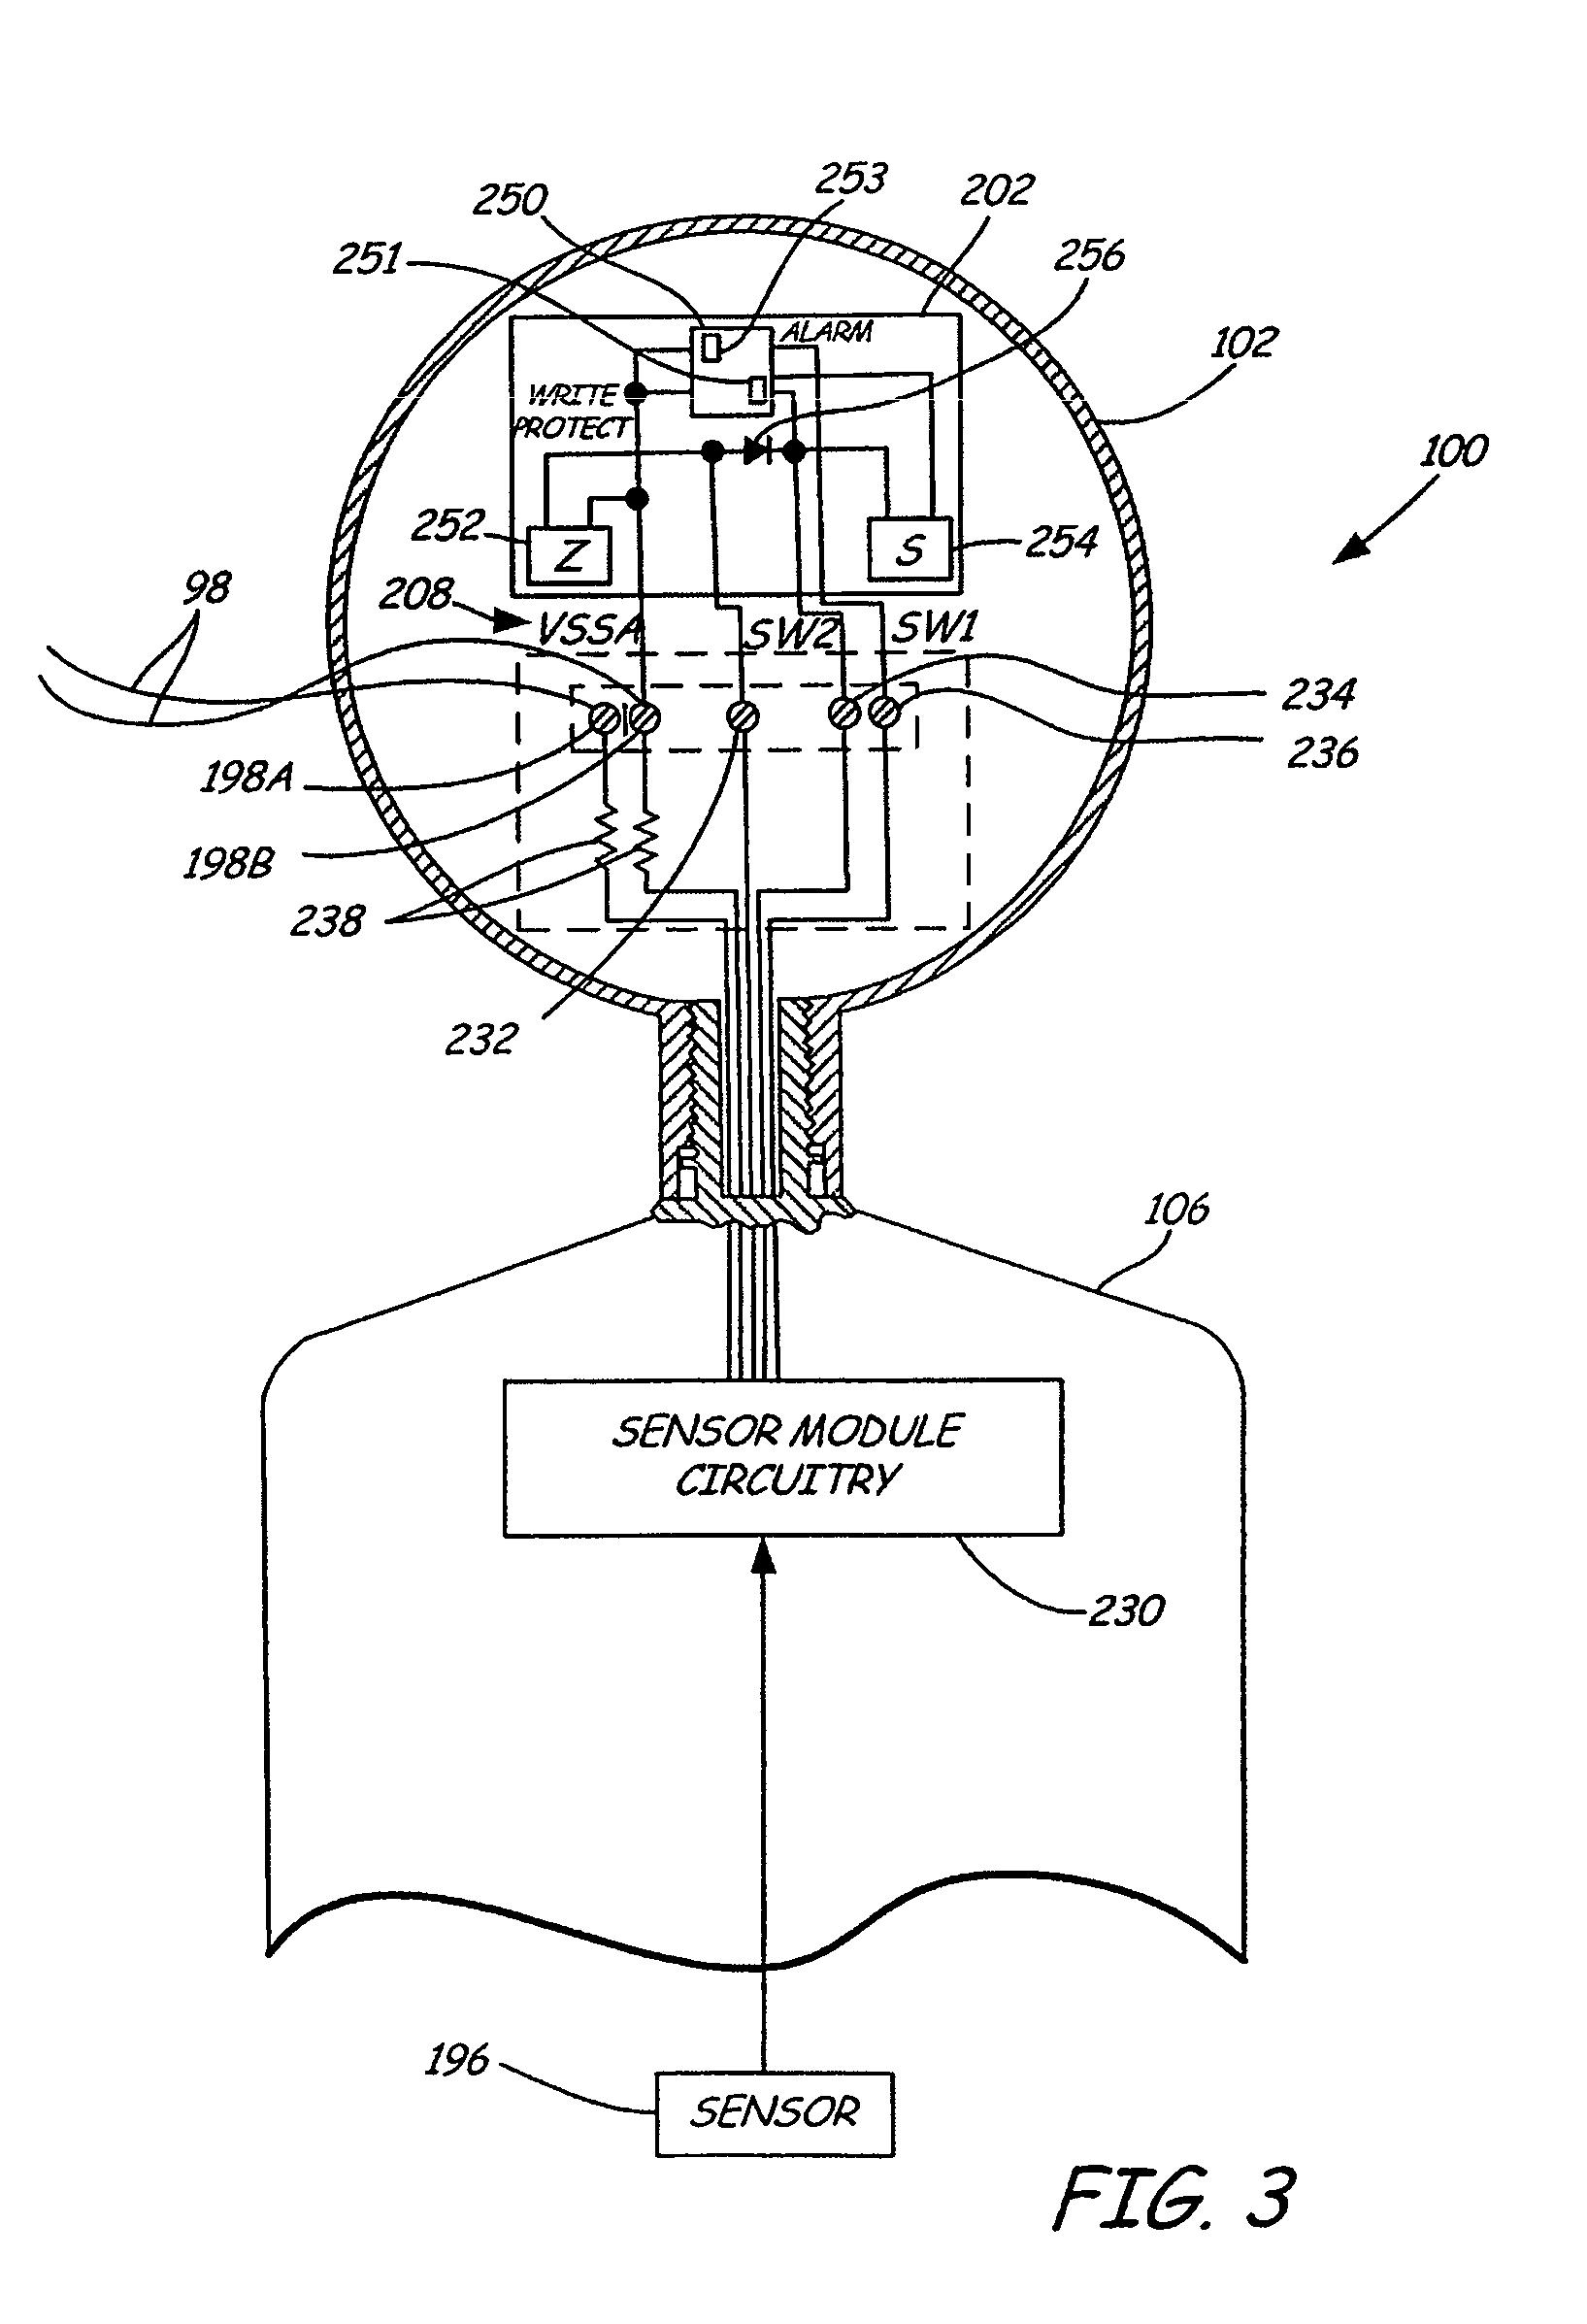 Rosemount Temperature Transmitter Wiring Diagram : 48